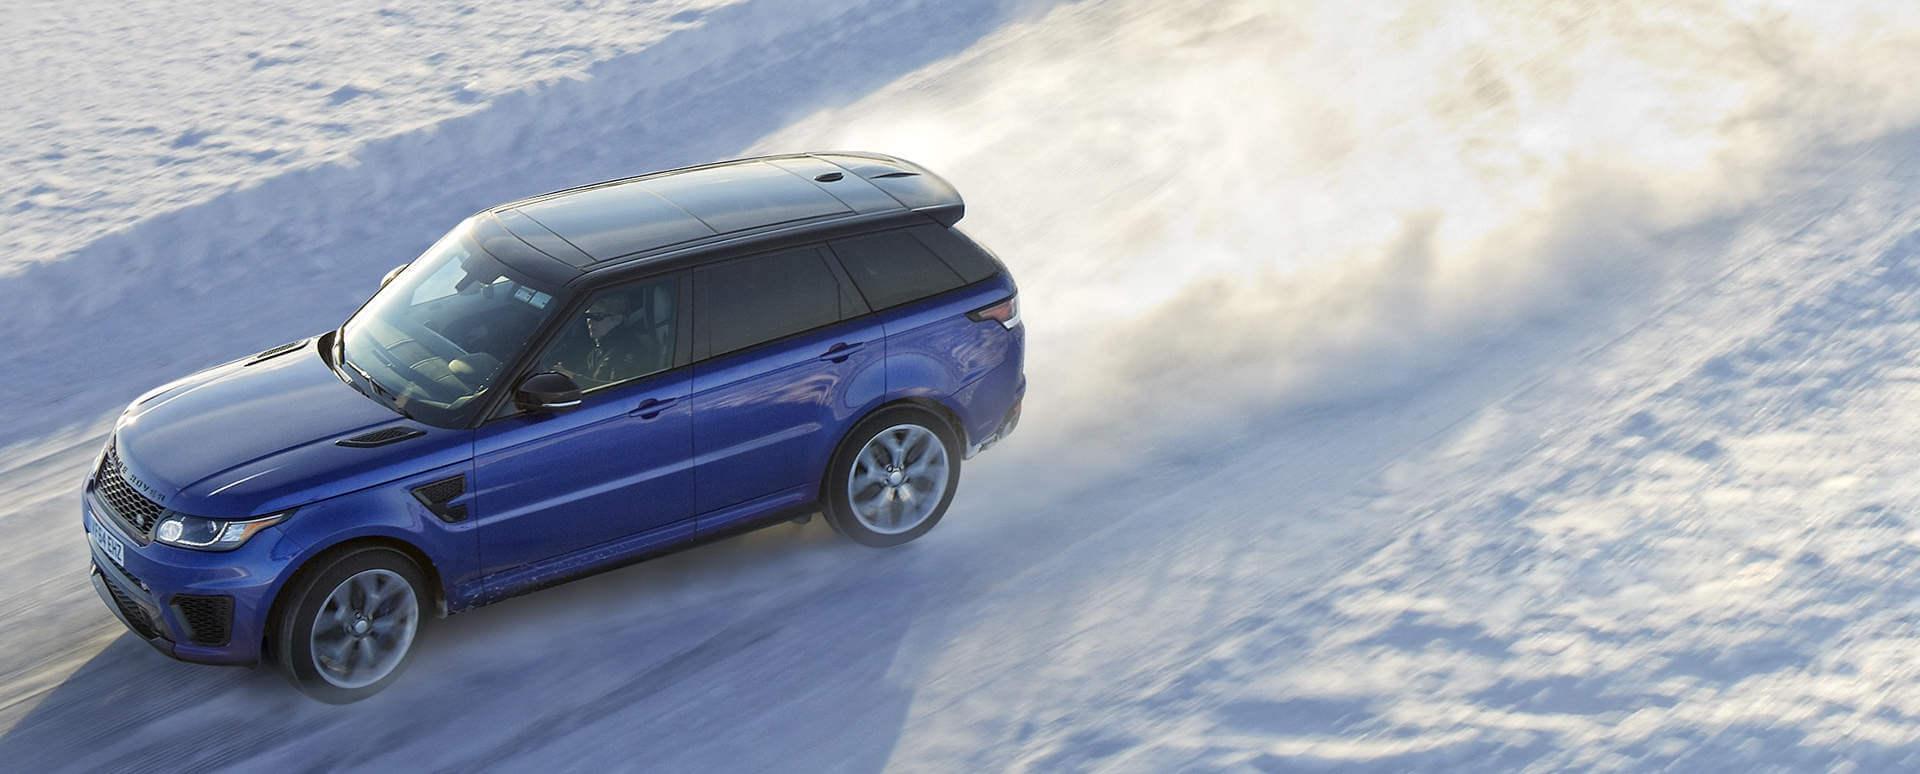 Range Rover Sport: Snow Driving